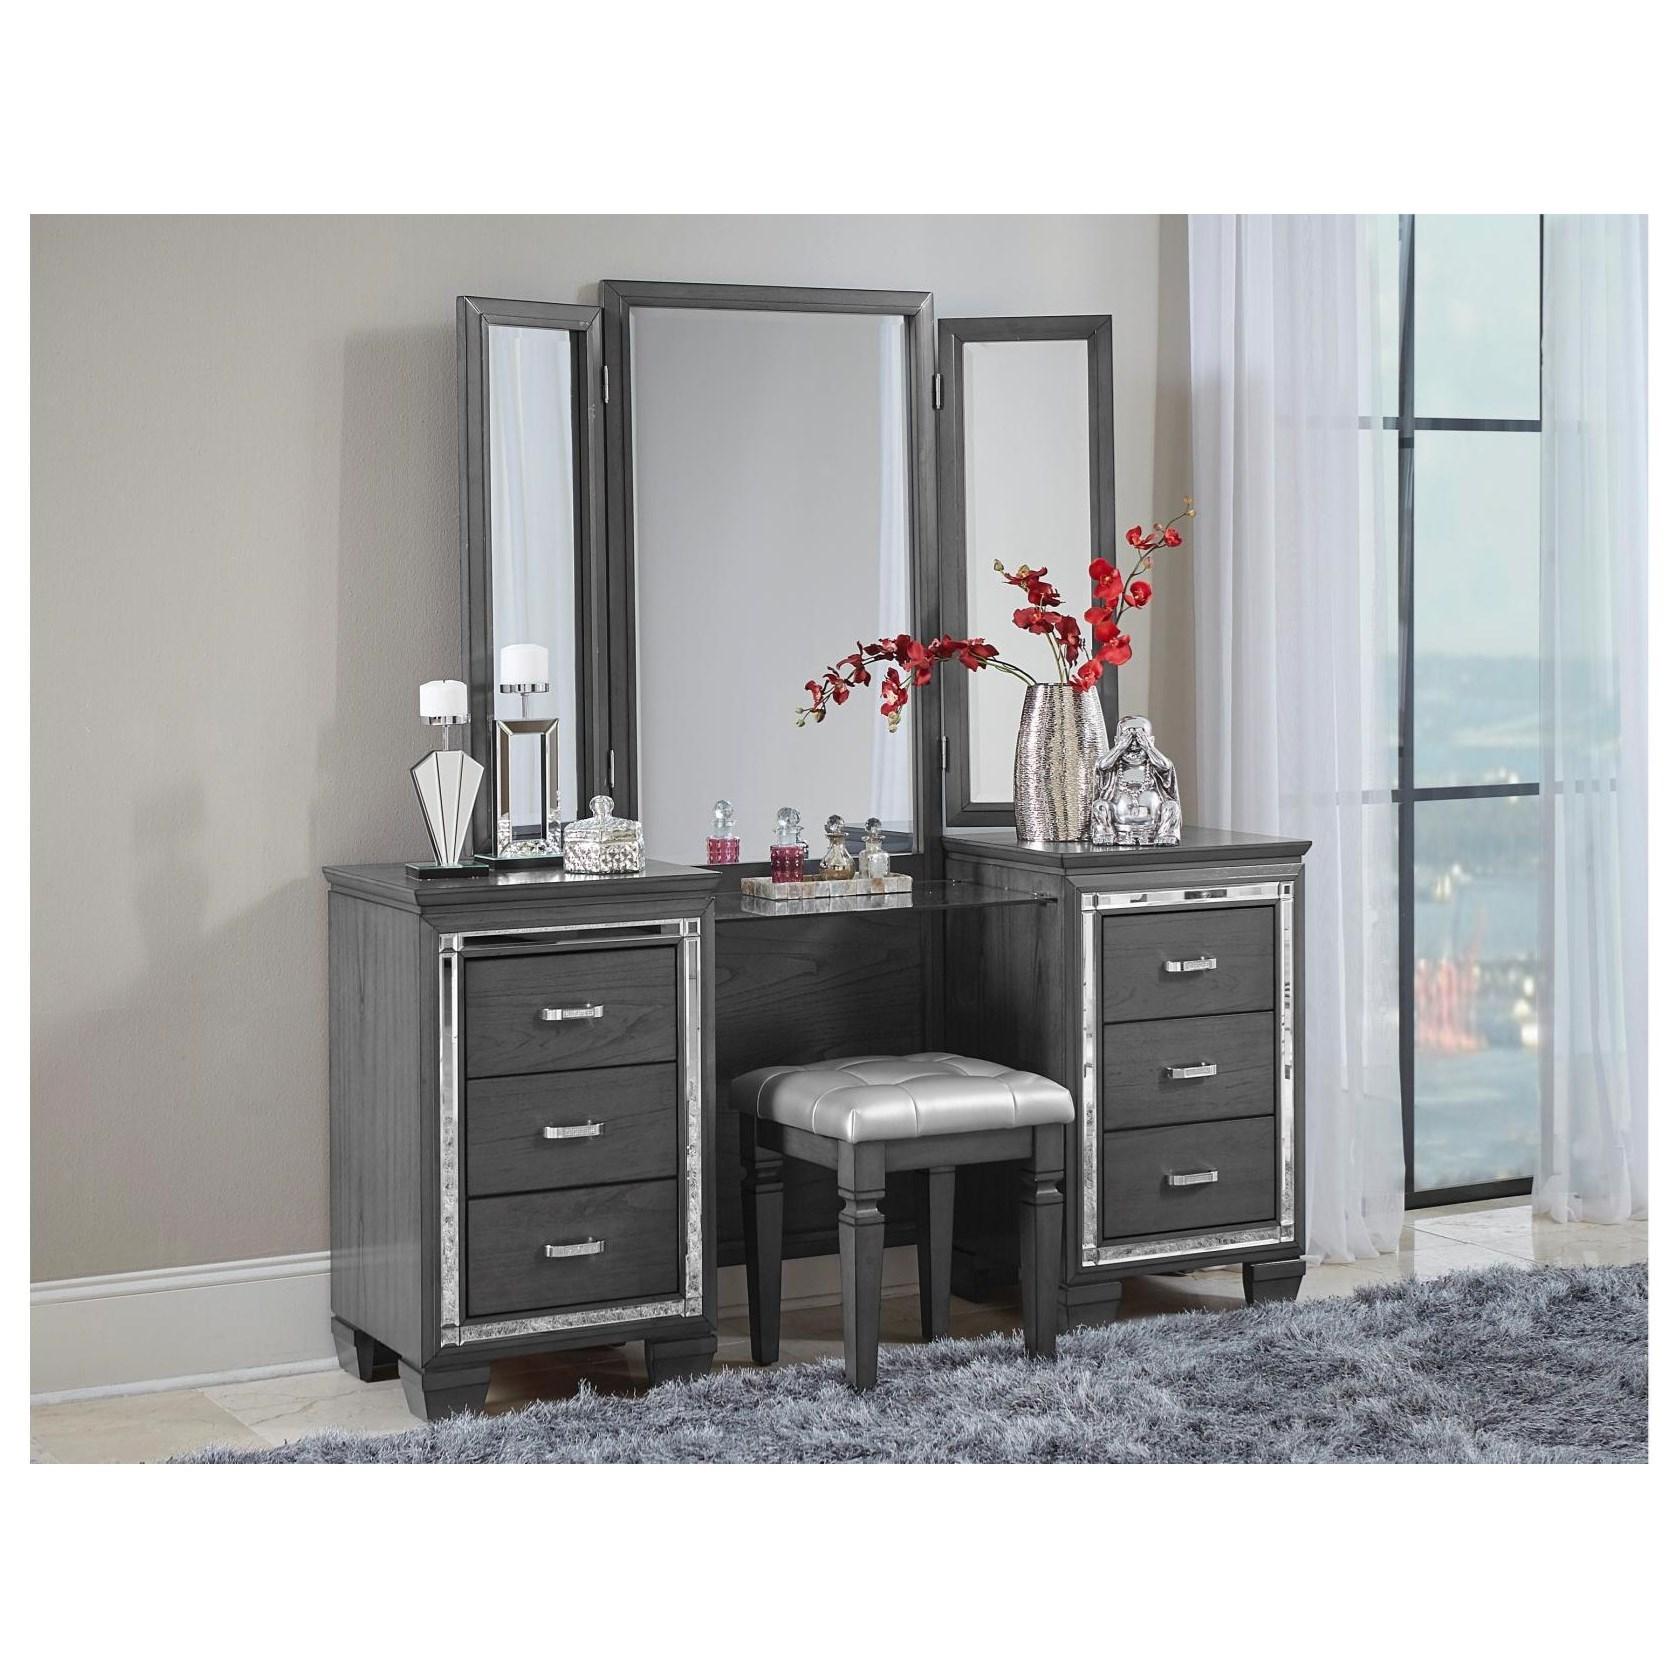 Allura Vanity Dresser by Homelegance at Value City Furniture